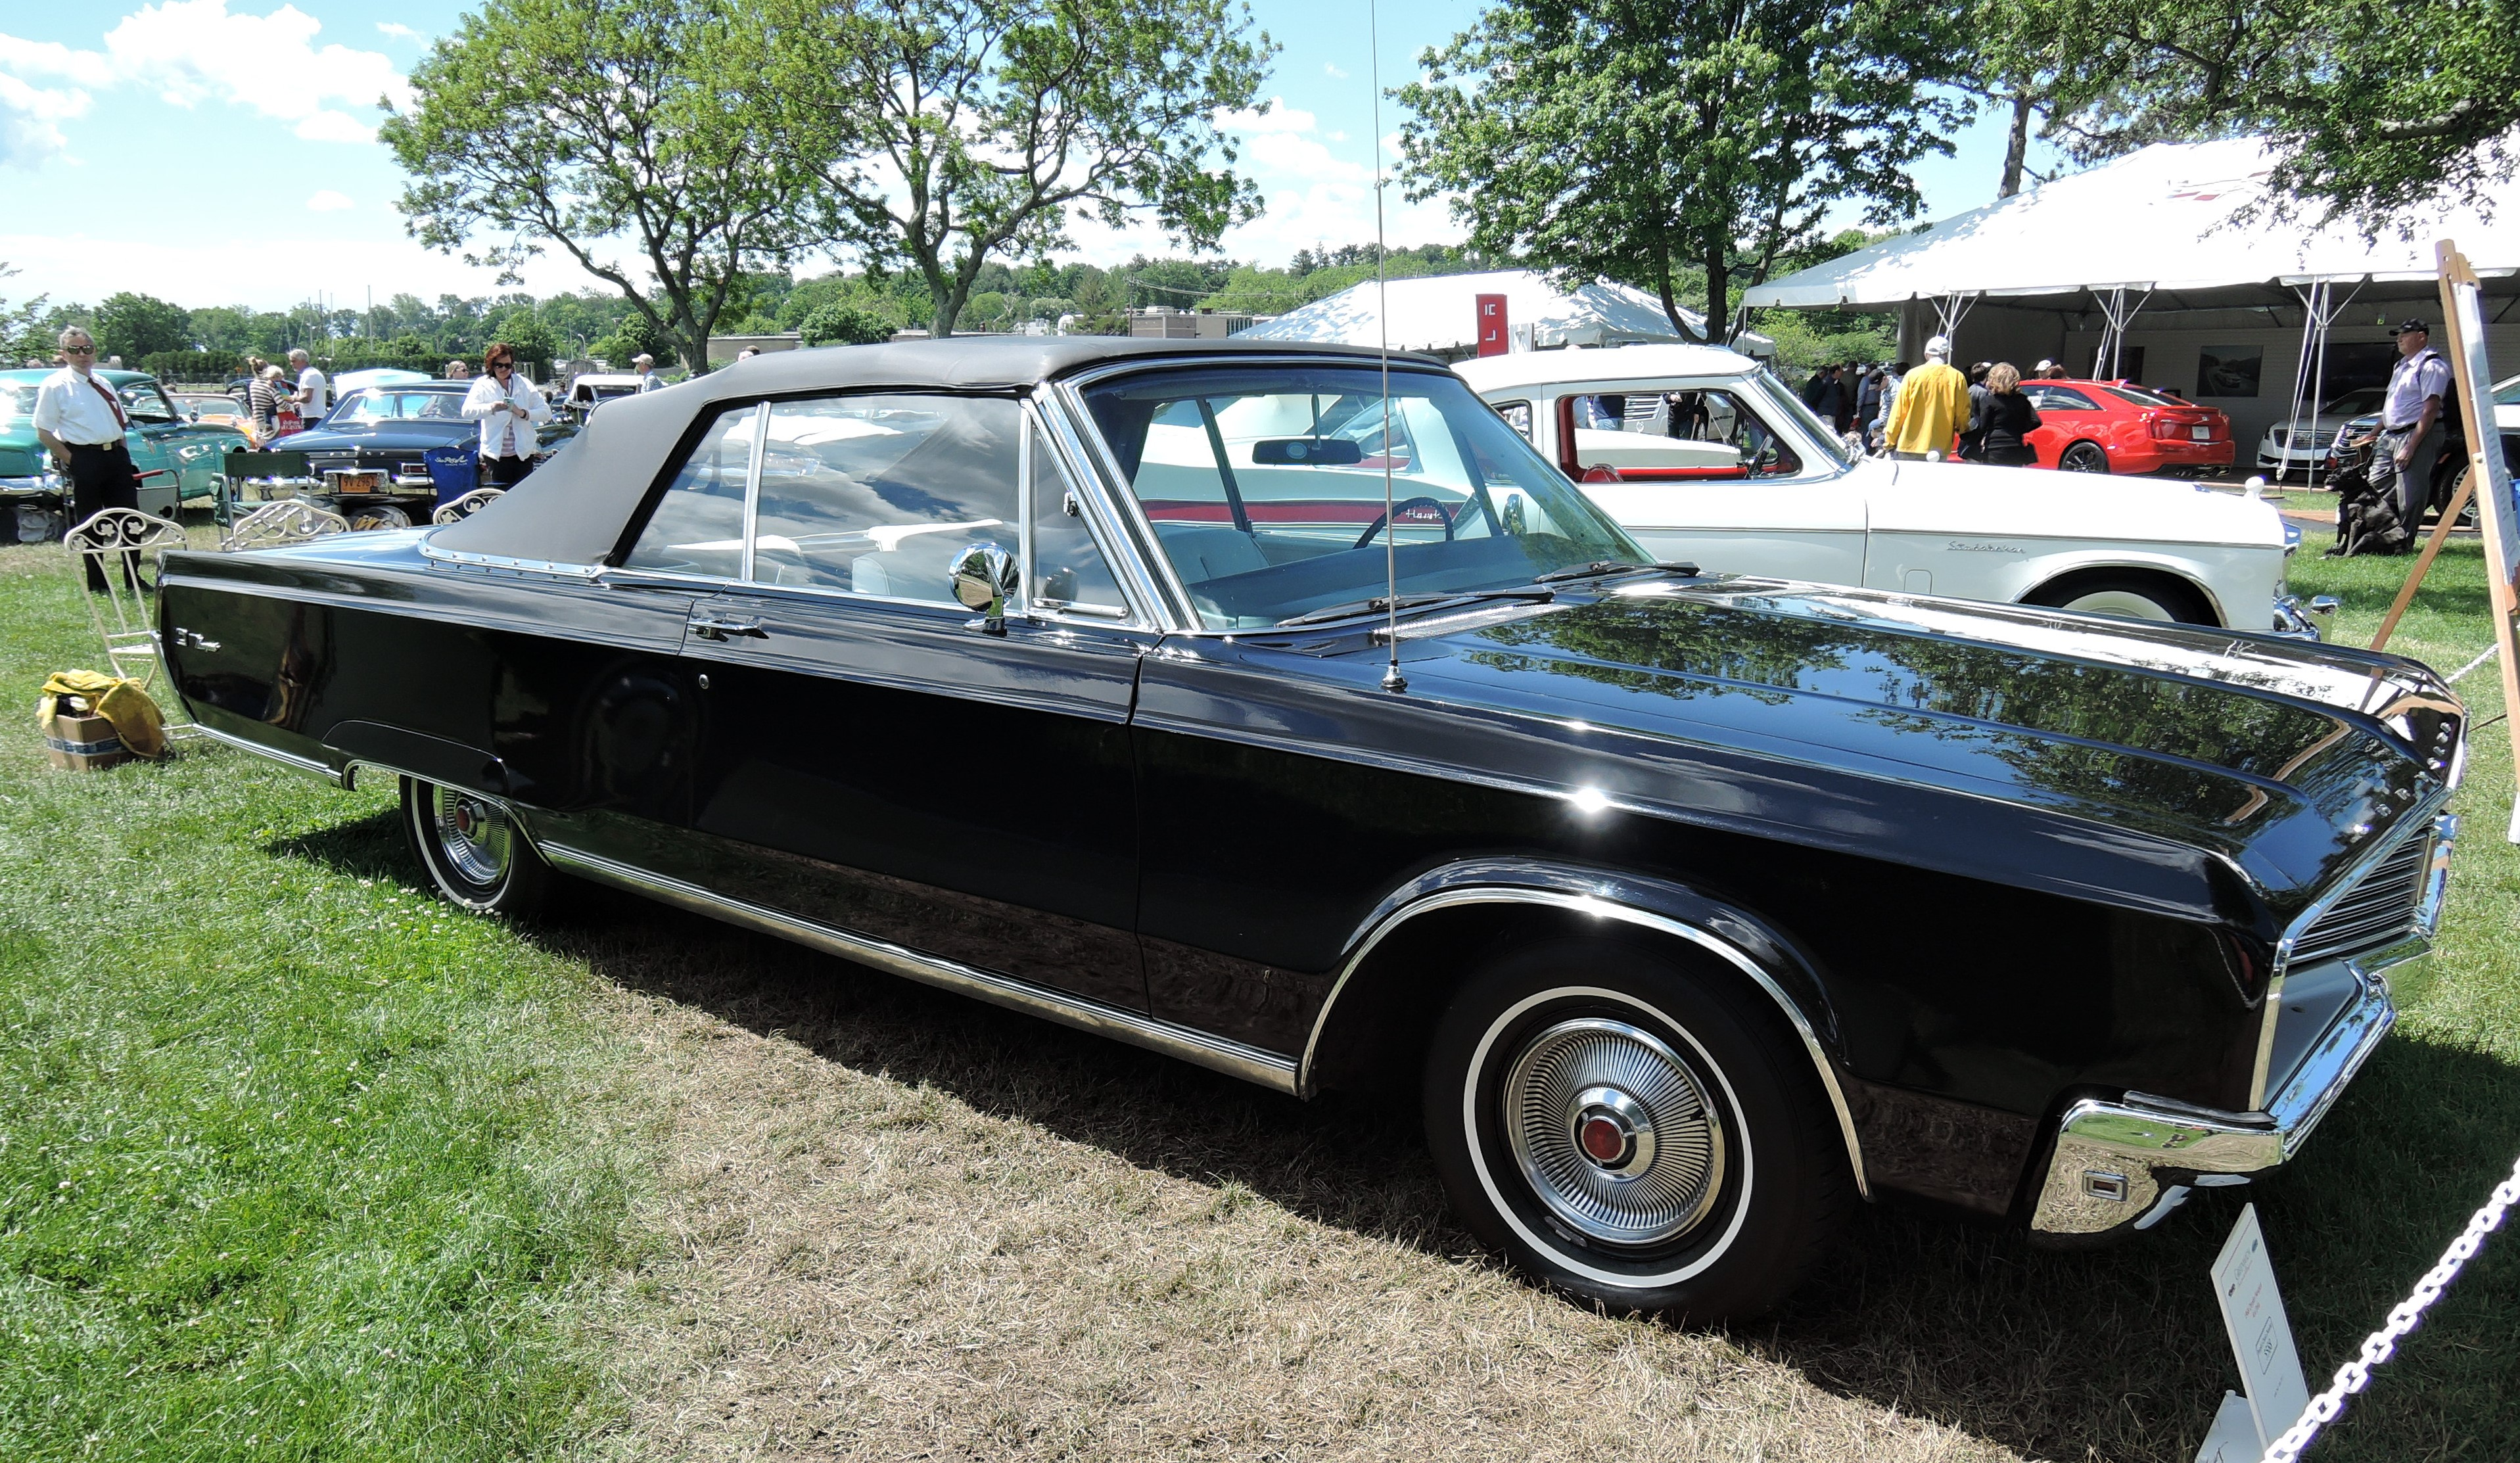 black 1968 Chrysler Newport - Greenwich Concours d'Elegance 2017